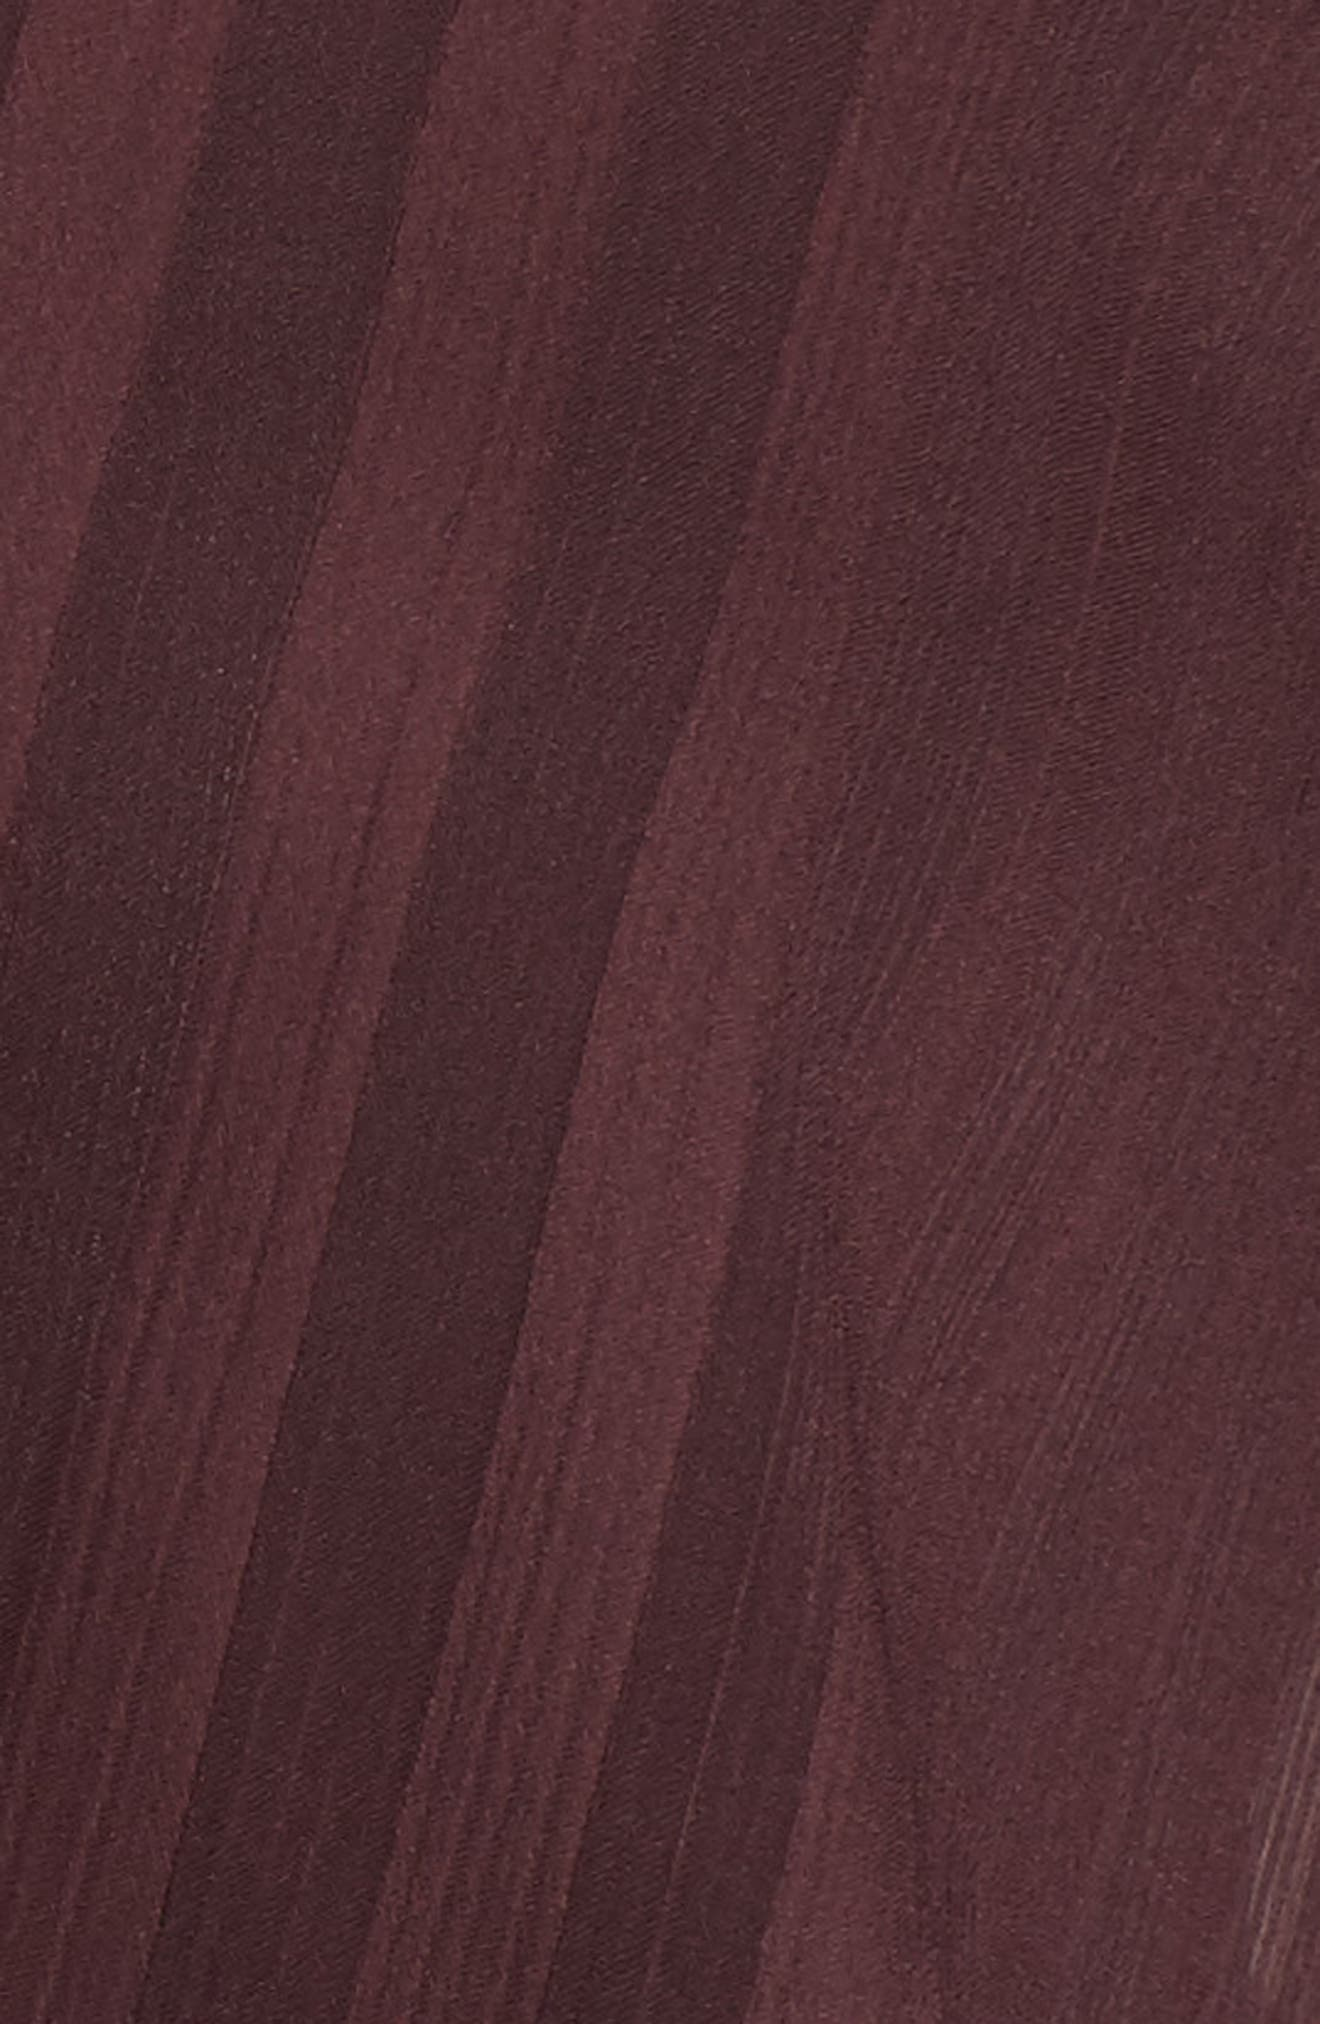 Sheer Shadow Stripe Top,                             Alternate thumbnail 5, color,                             Burgundy Stem